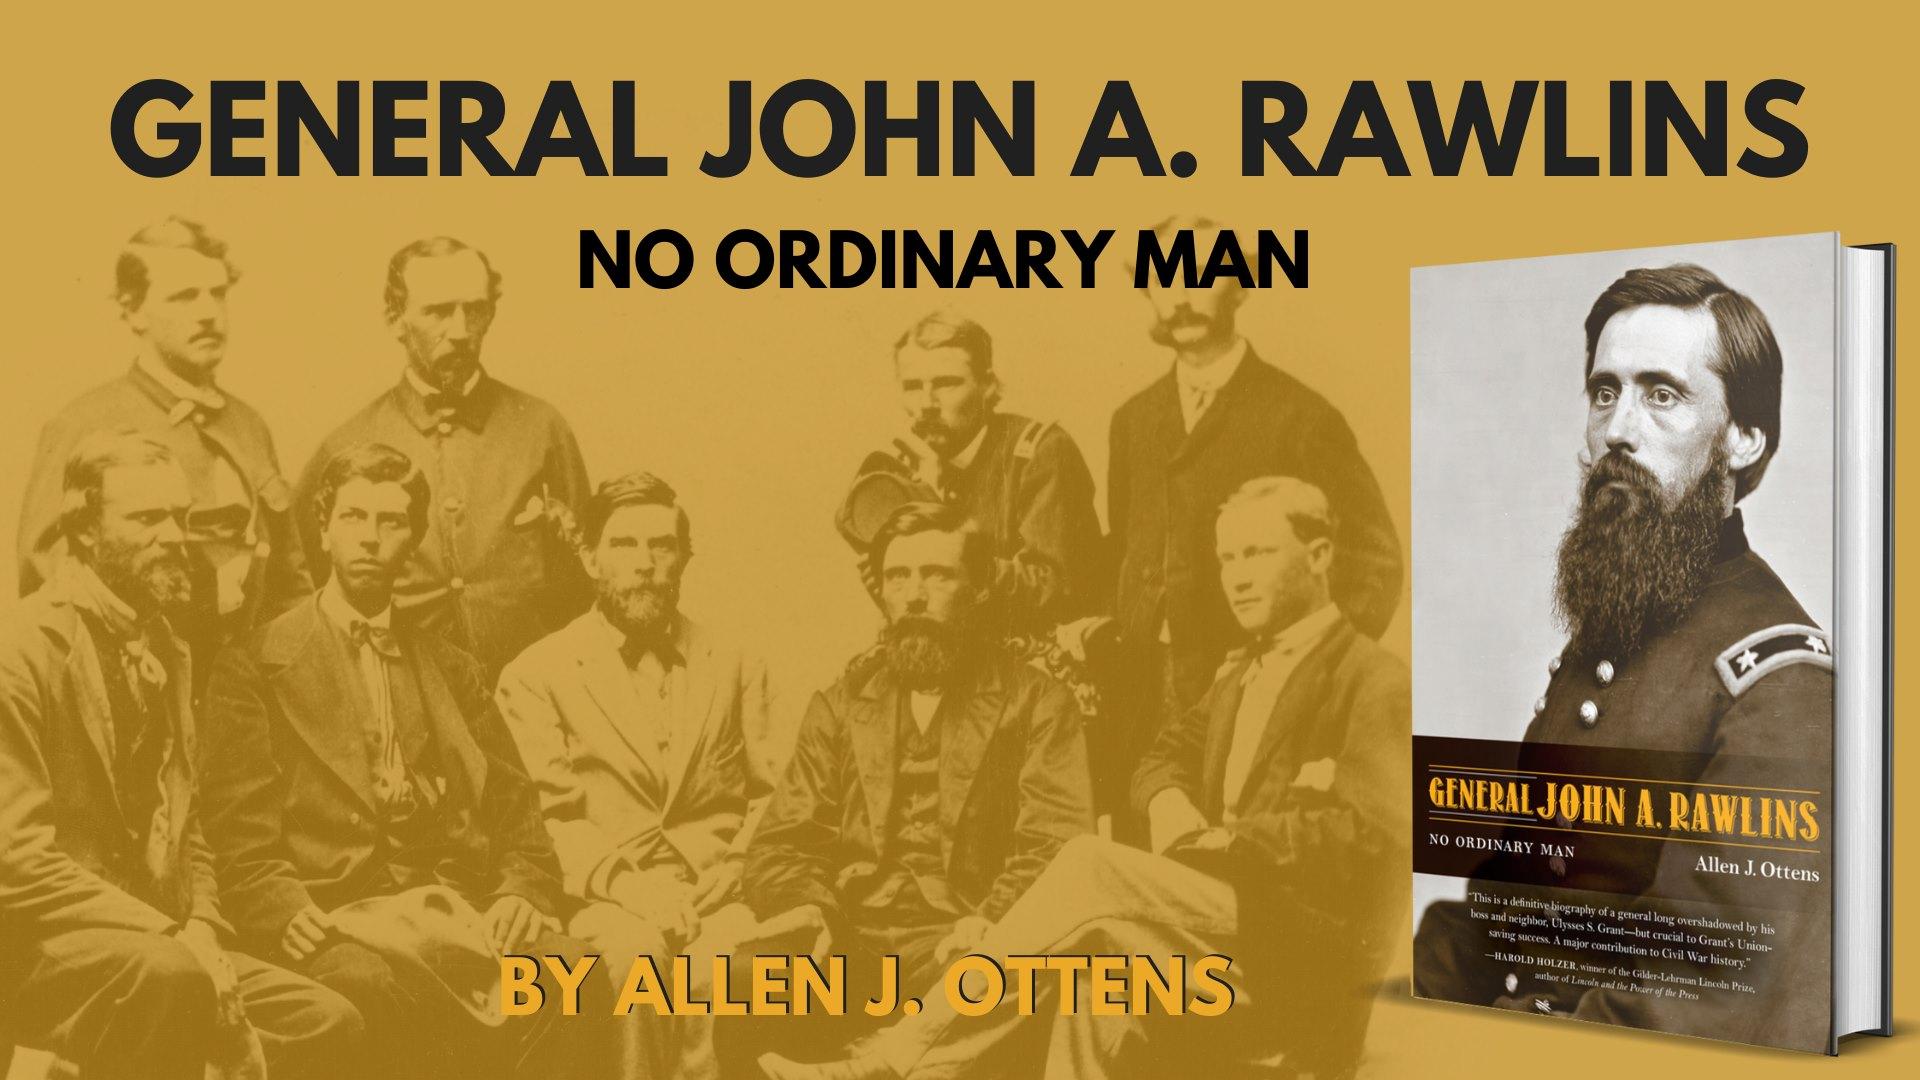 General John A Rawlins event